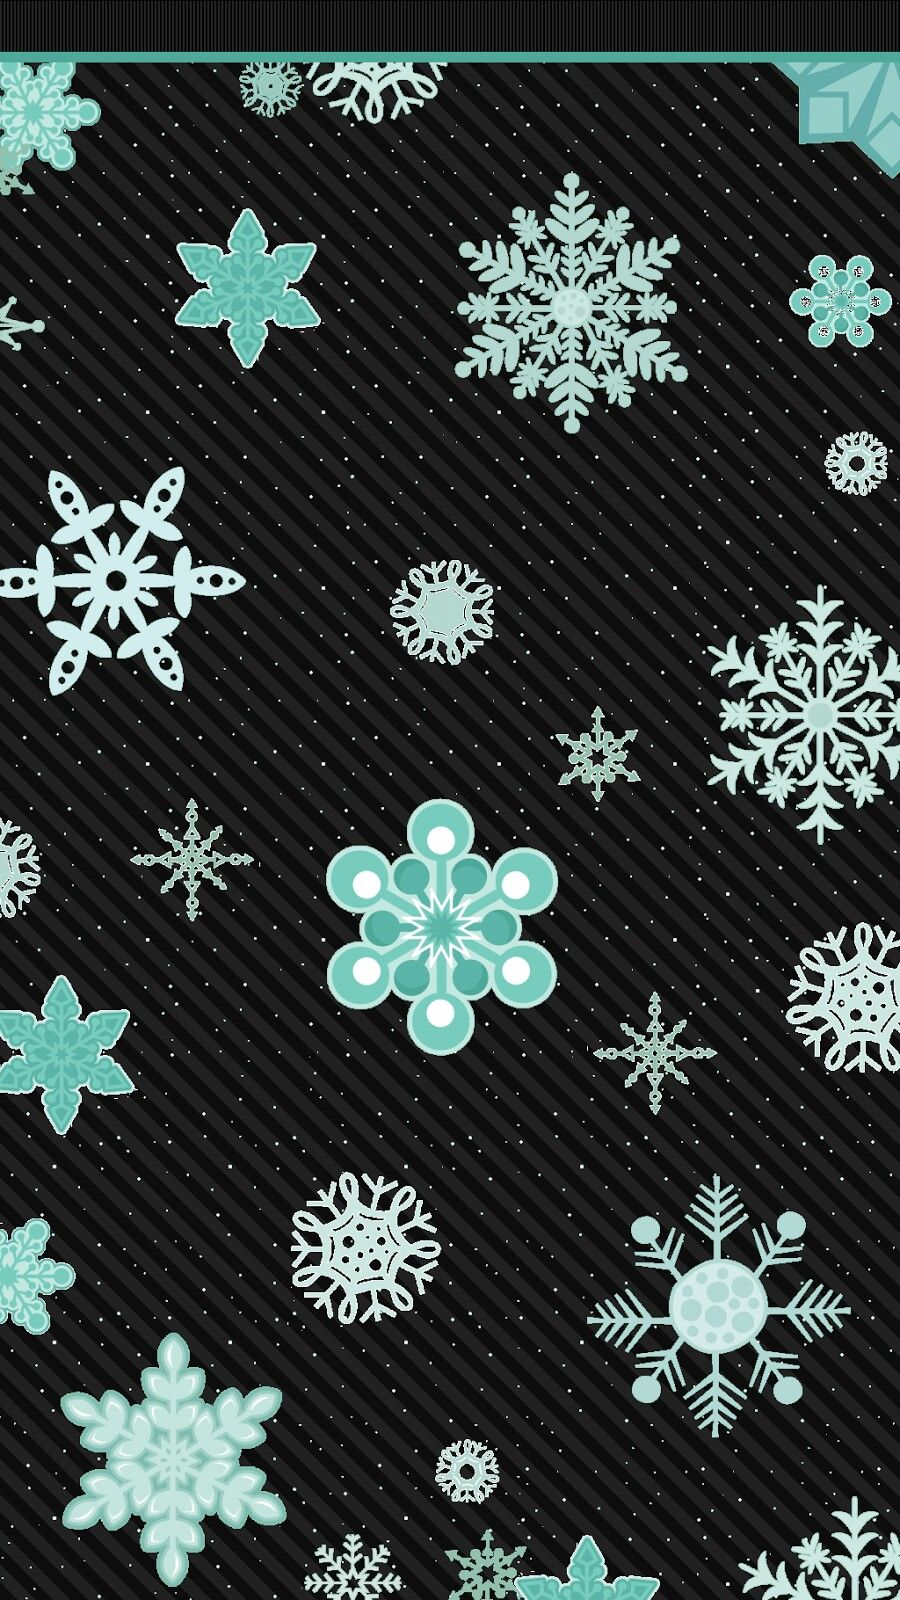 cute snowflake wallpaper phone wallpapers Pinterest